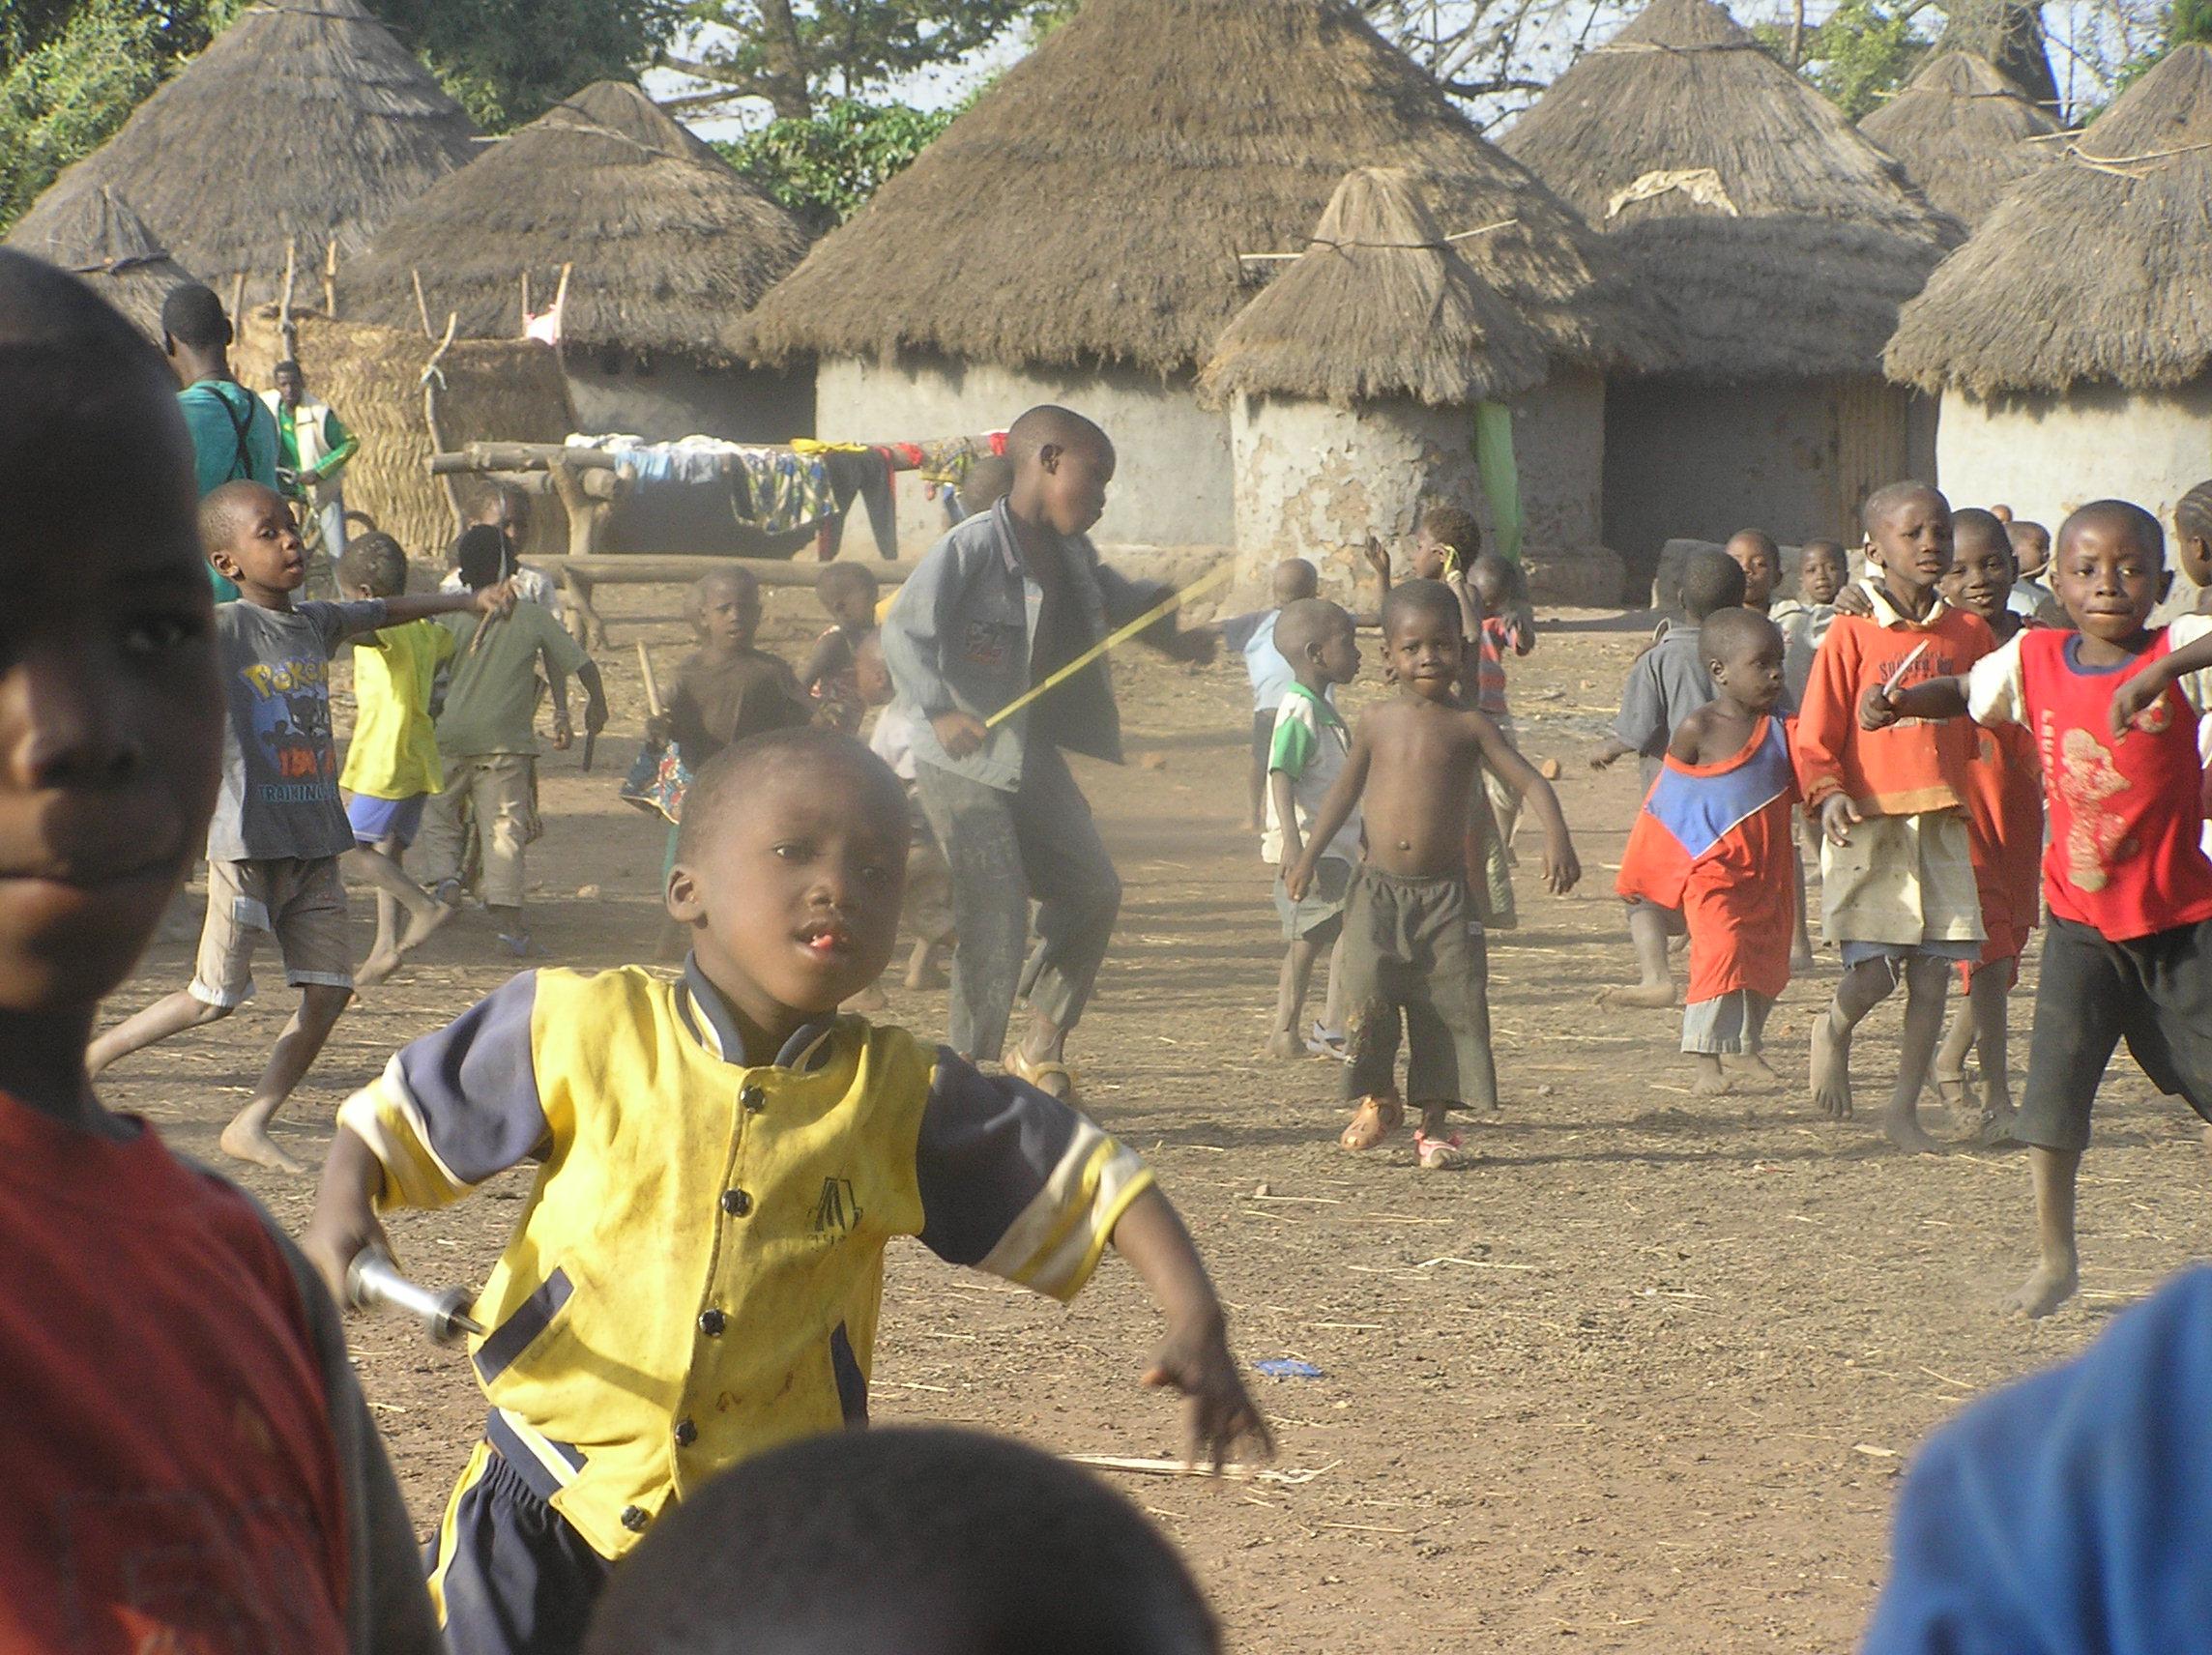 Foto Baro - Kinder tanzen